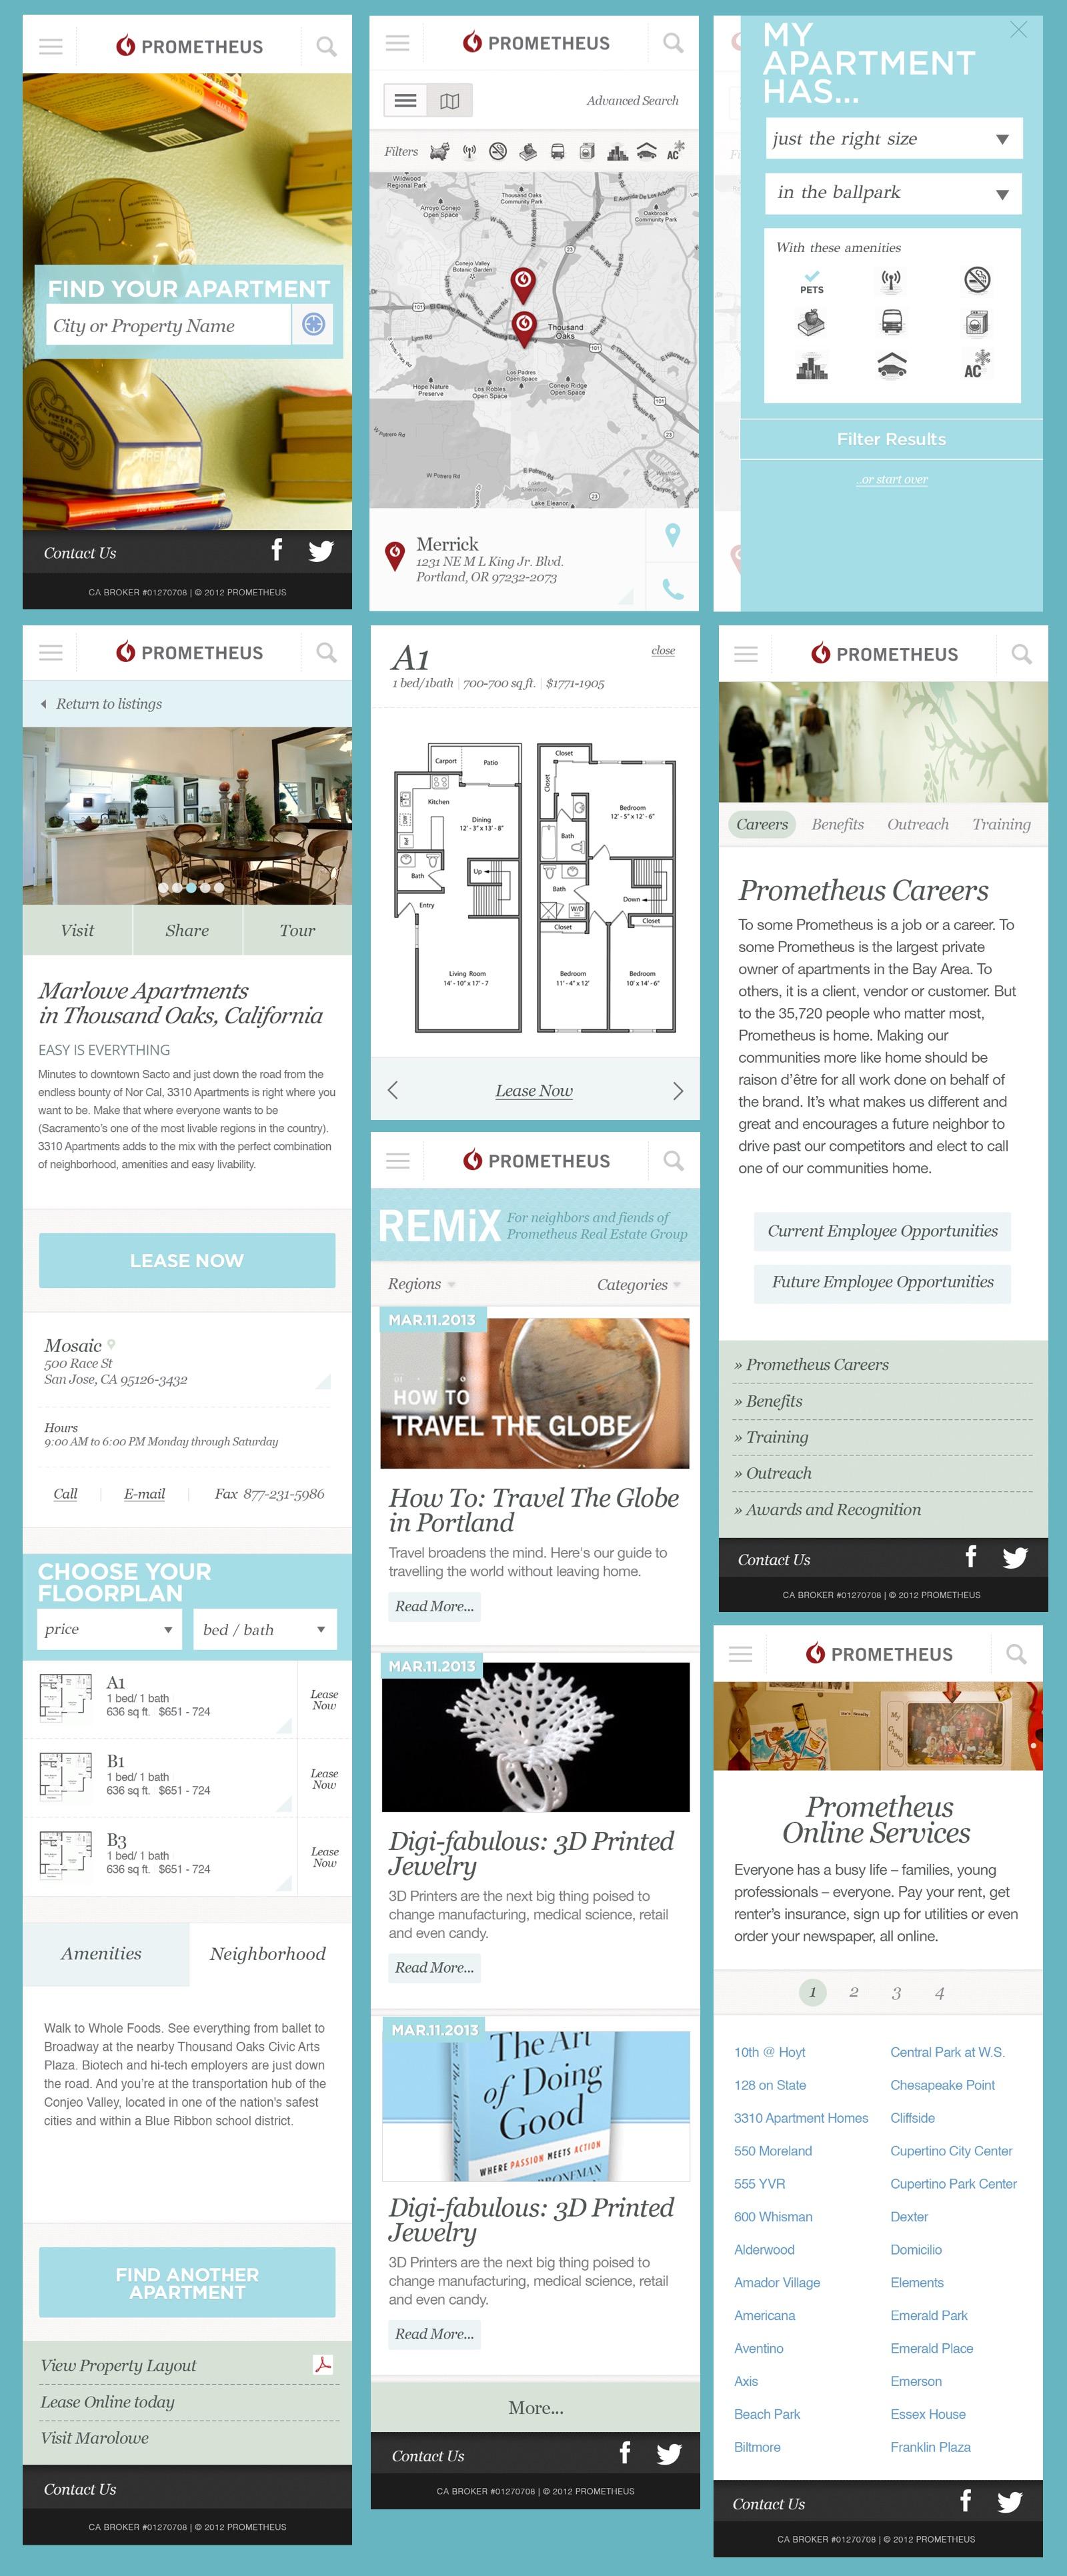 Screenshots of the Prometheus mobile website